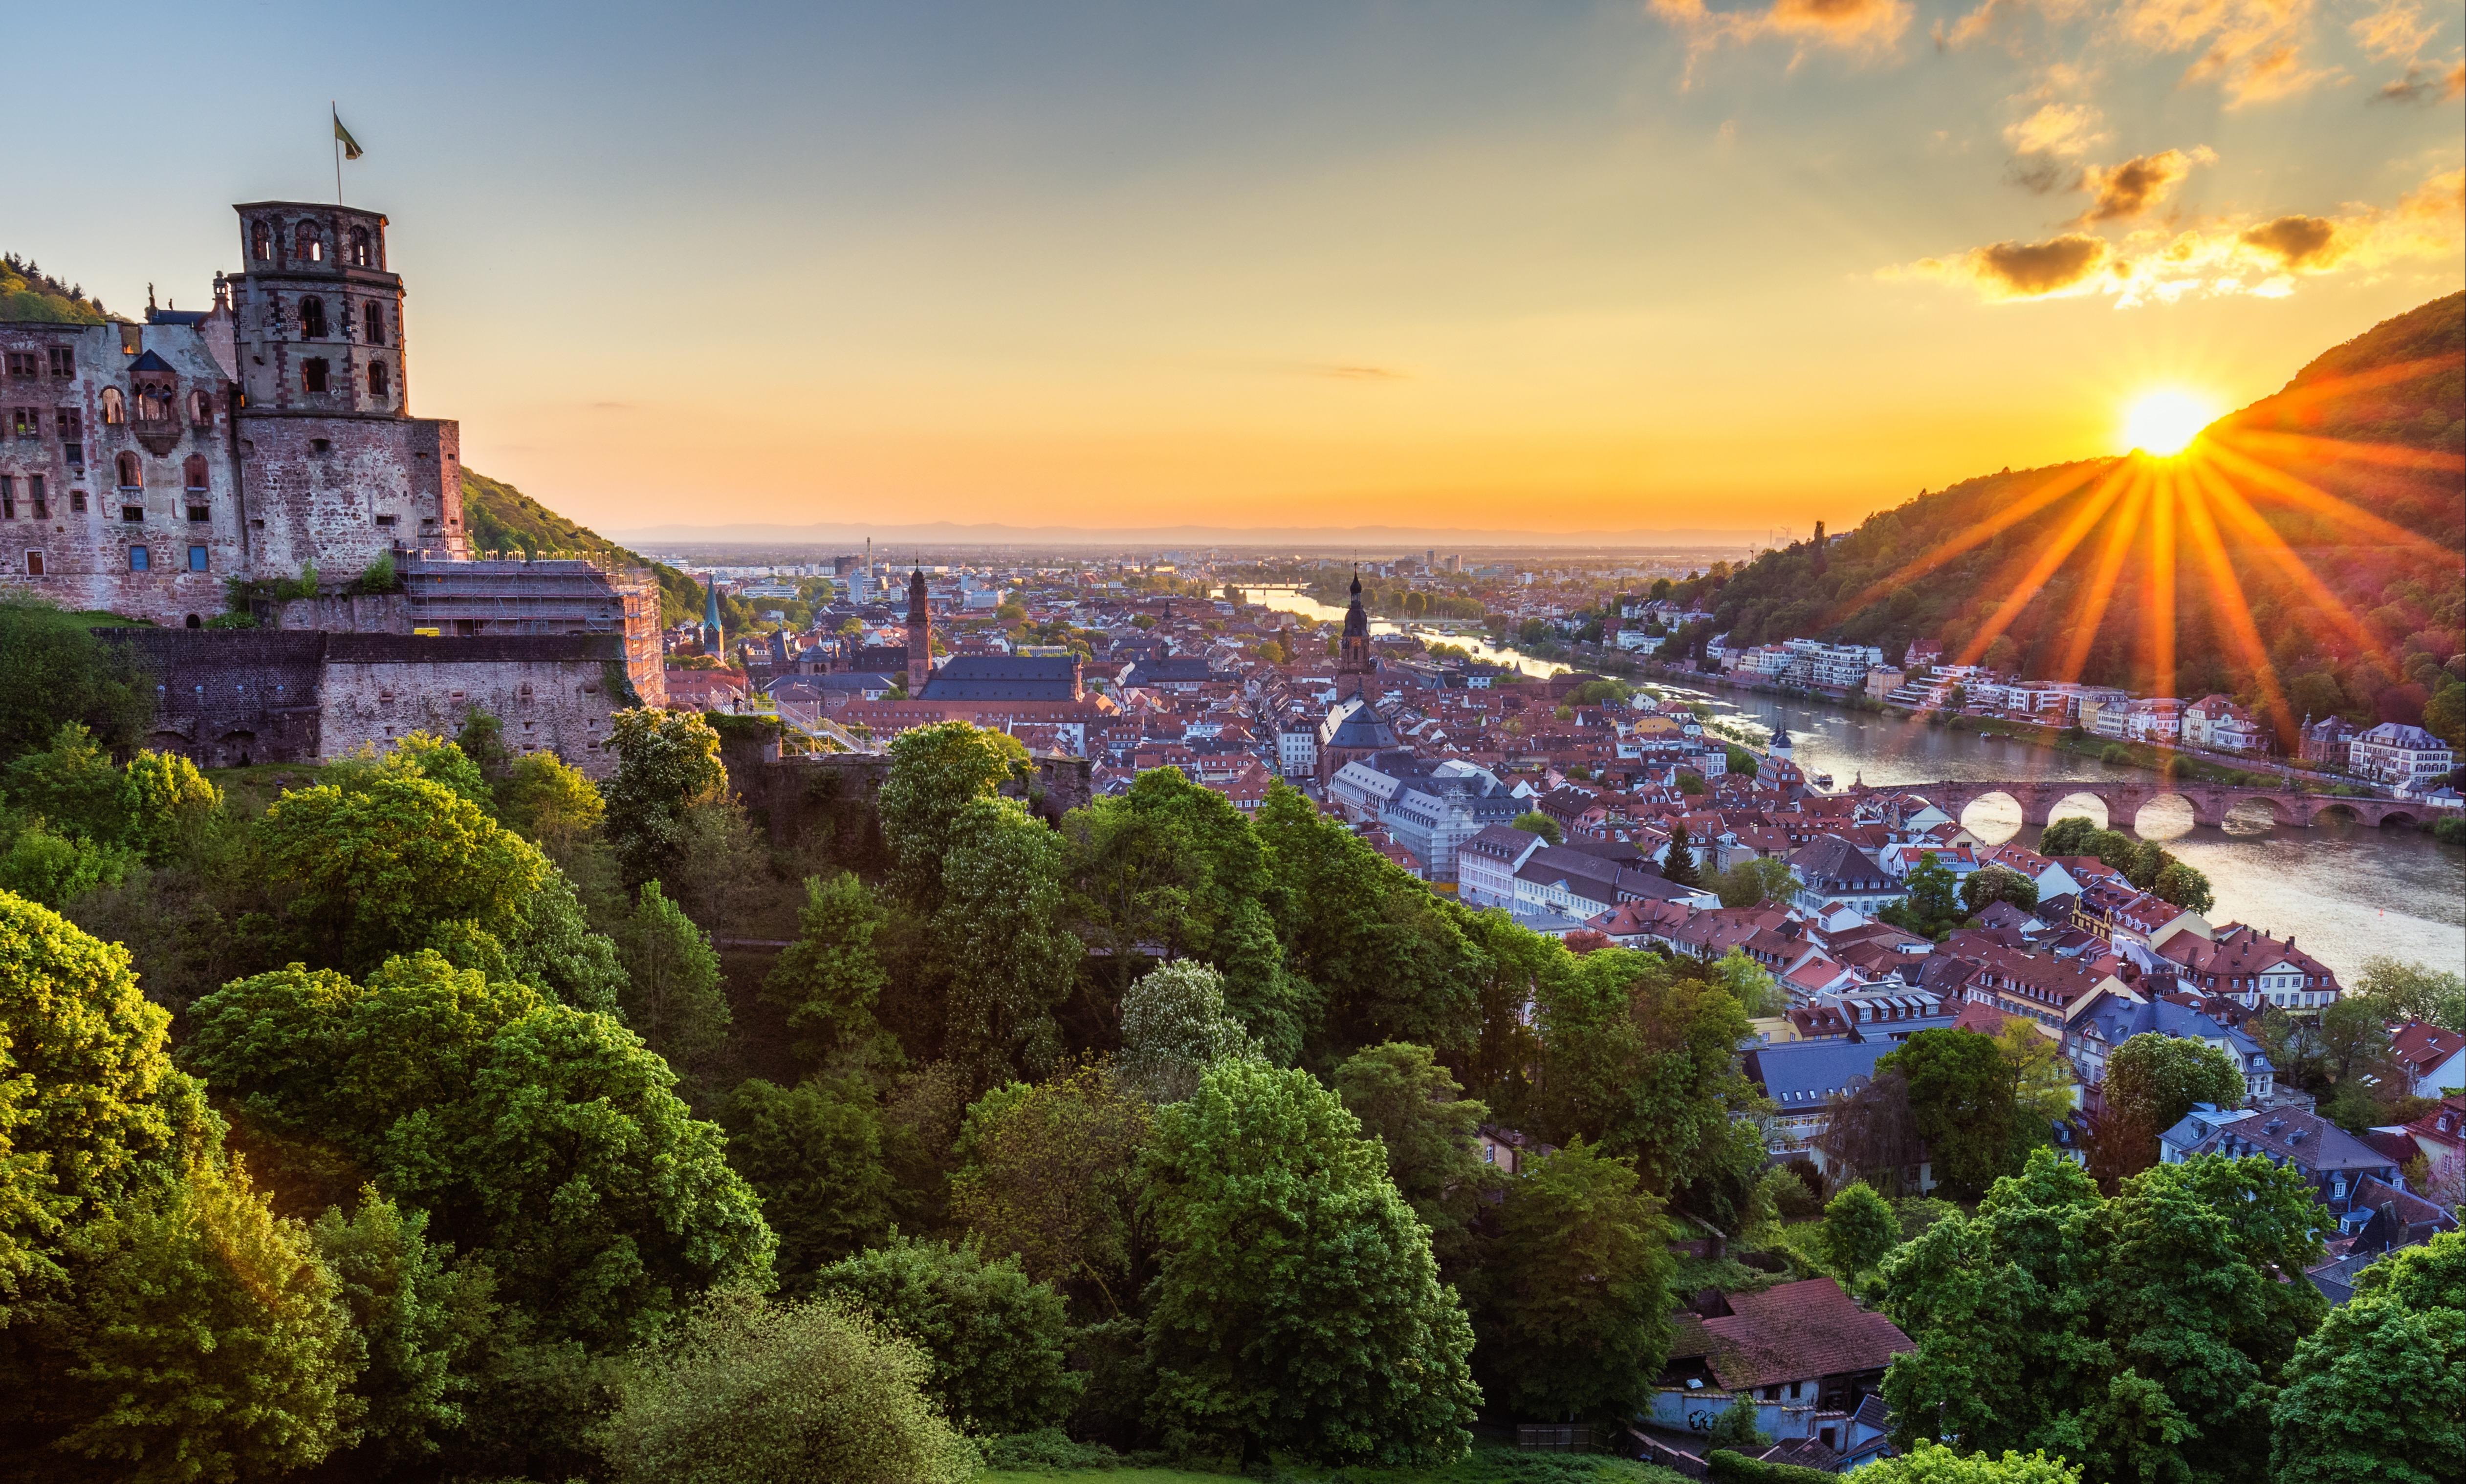 Rhine River in Heidelberg, Germany